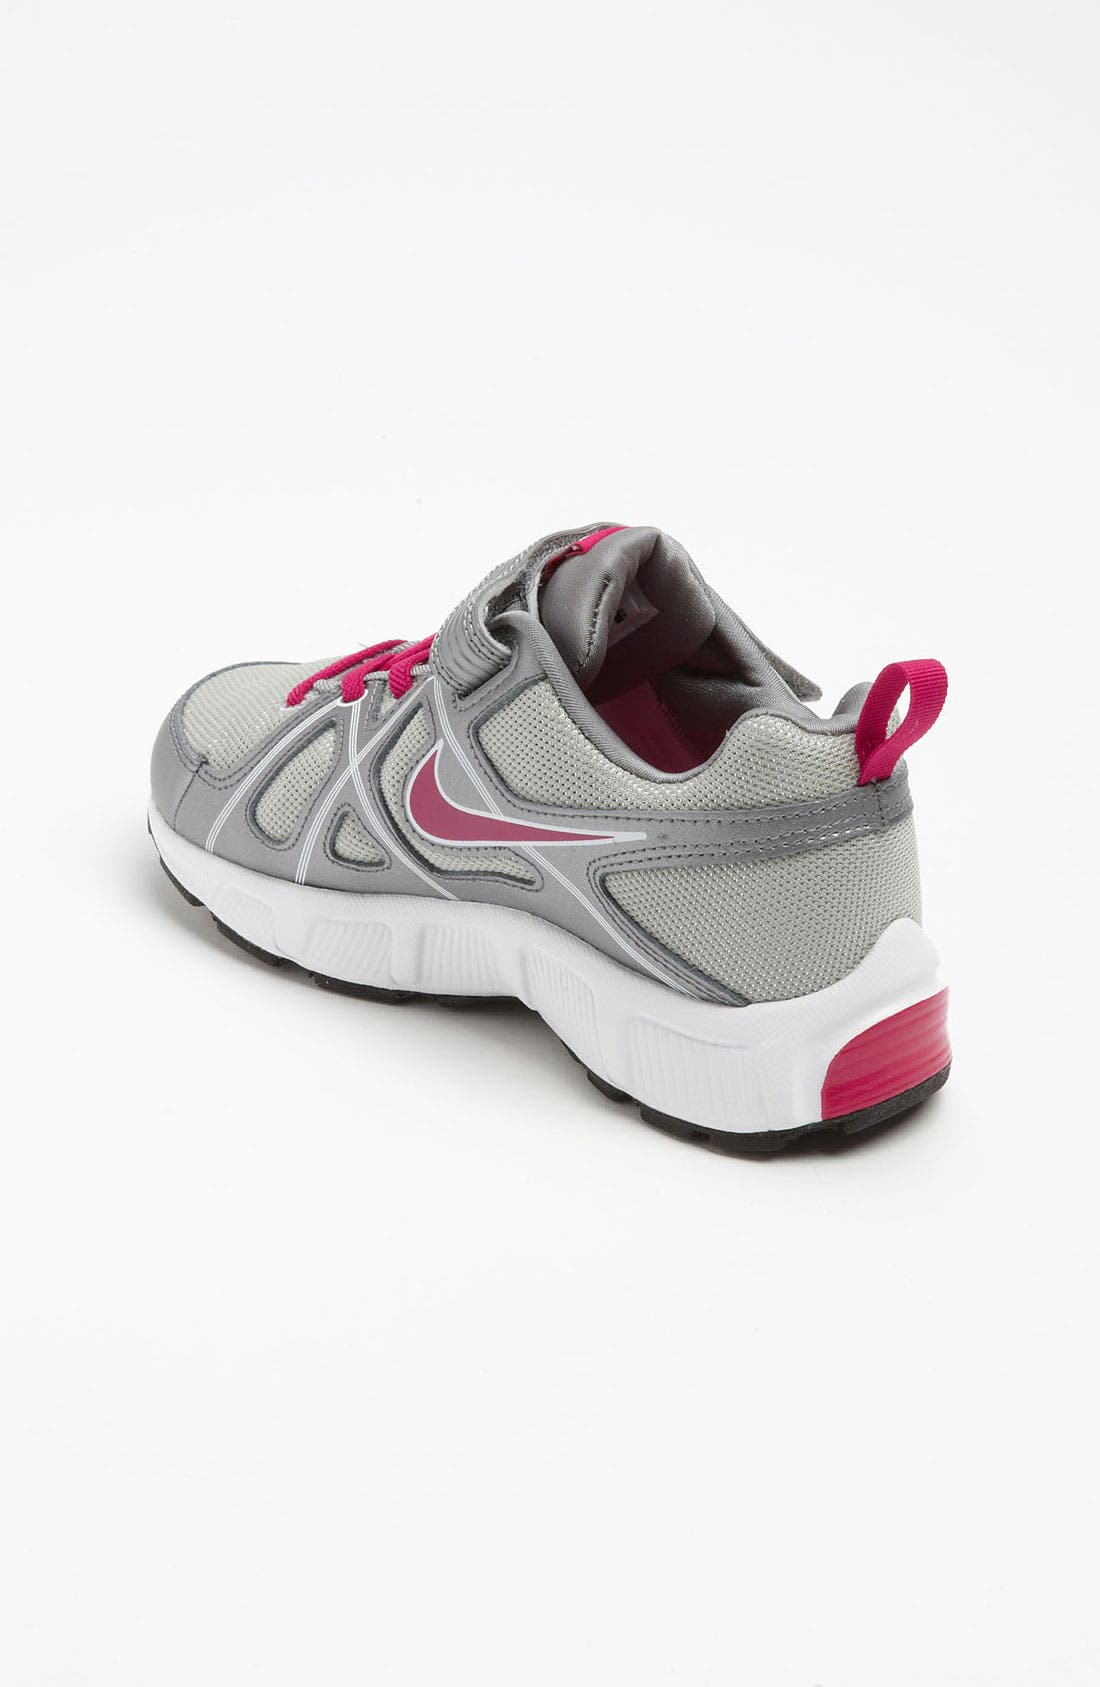 Alternate Image 2  - Nike 'T-Run 3 Alt' Running Shoe (Toddler, Little Kid & Big Kid) (Special Purchase)